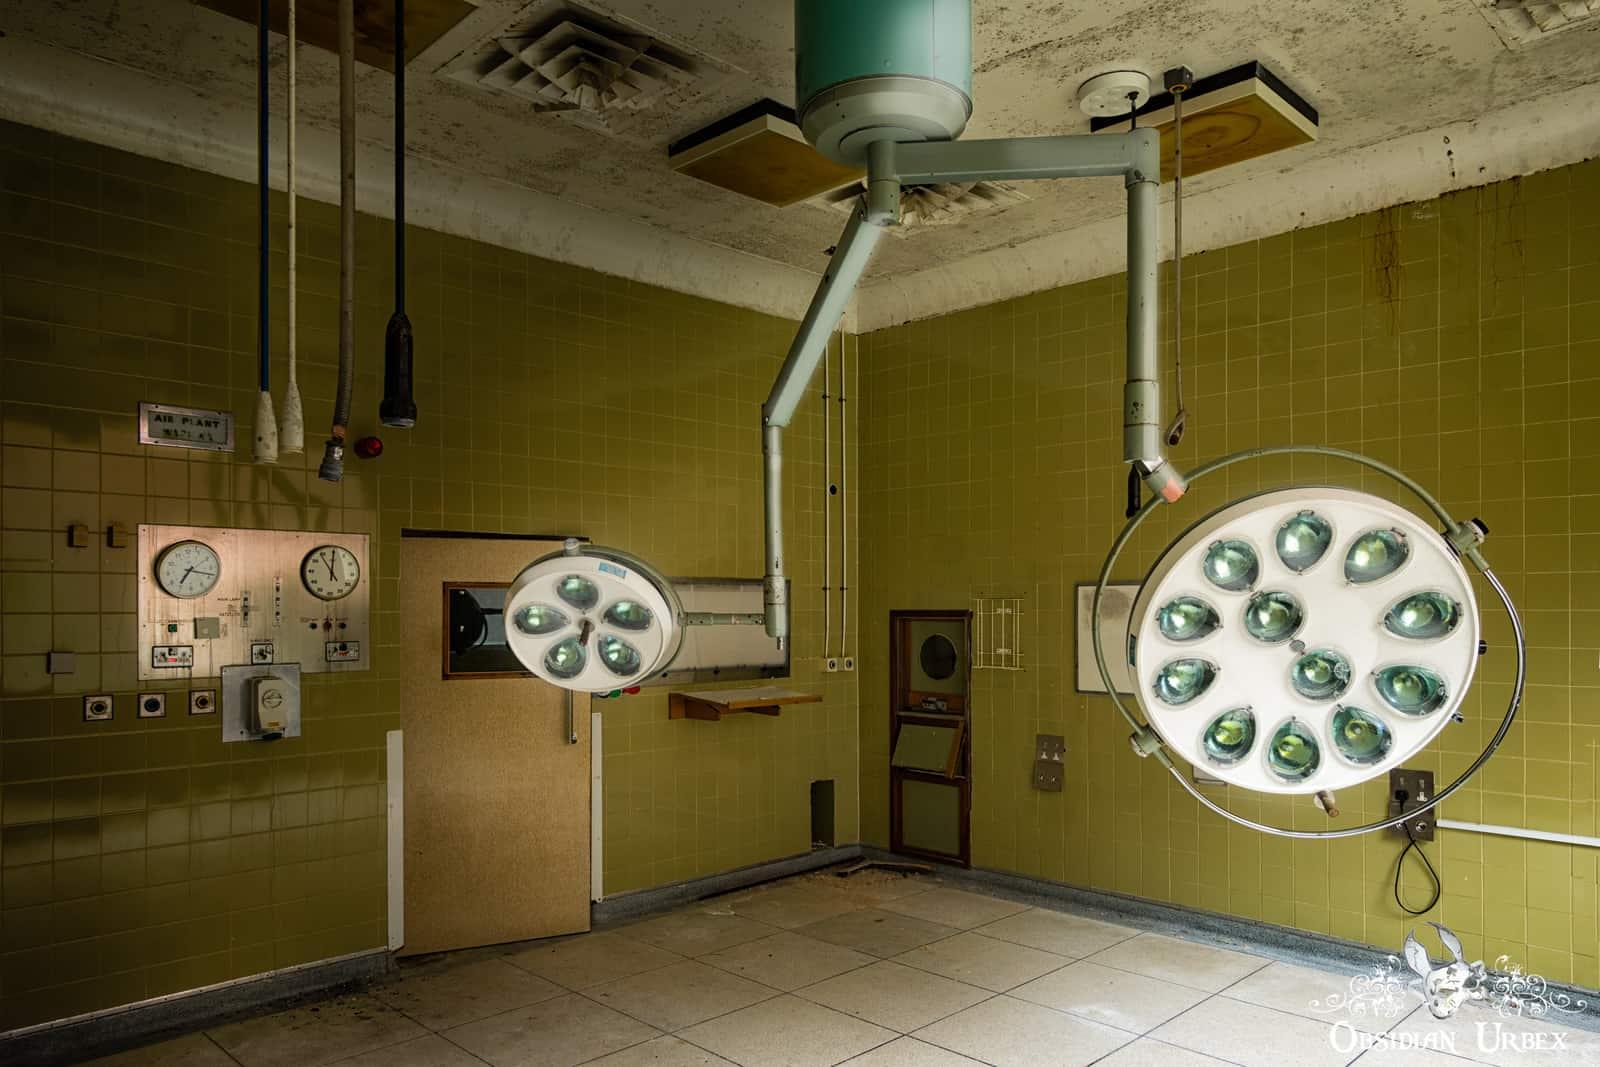 Hospital and Morgue S, England - Obsidian Urbex Photography | Urban